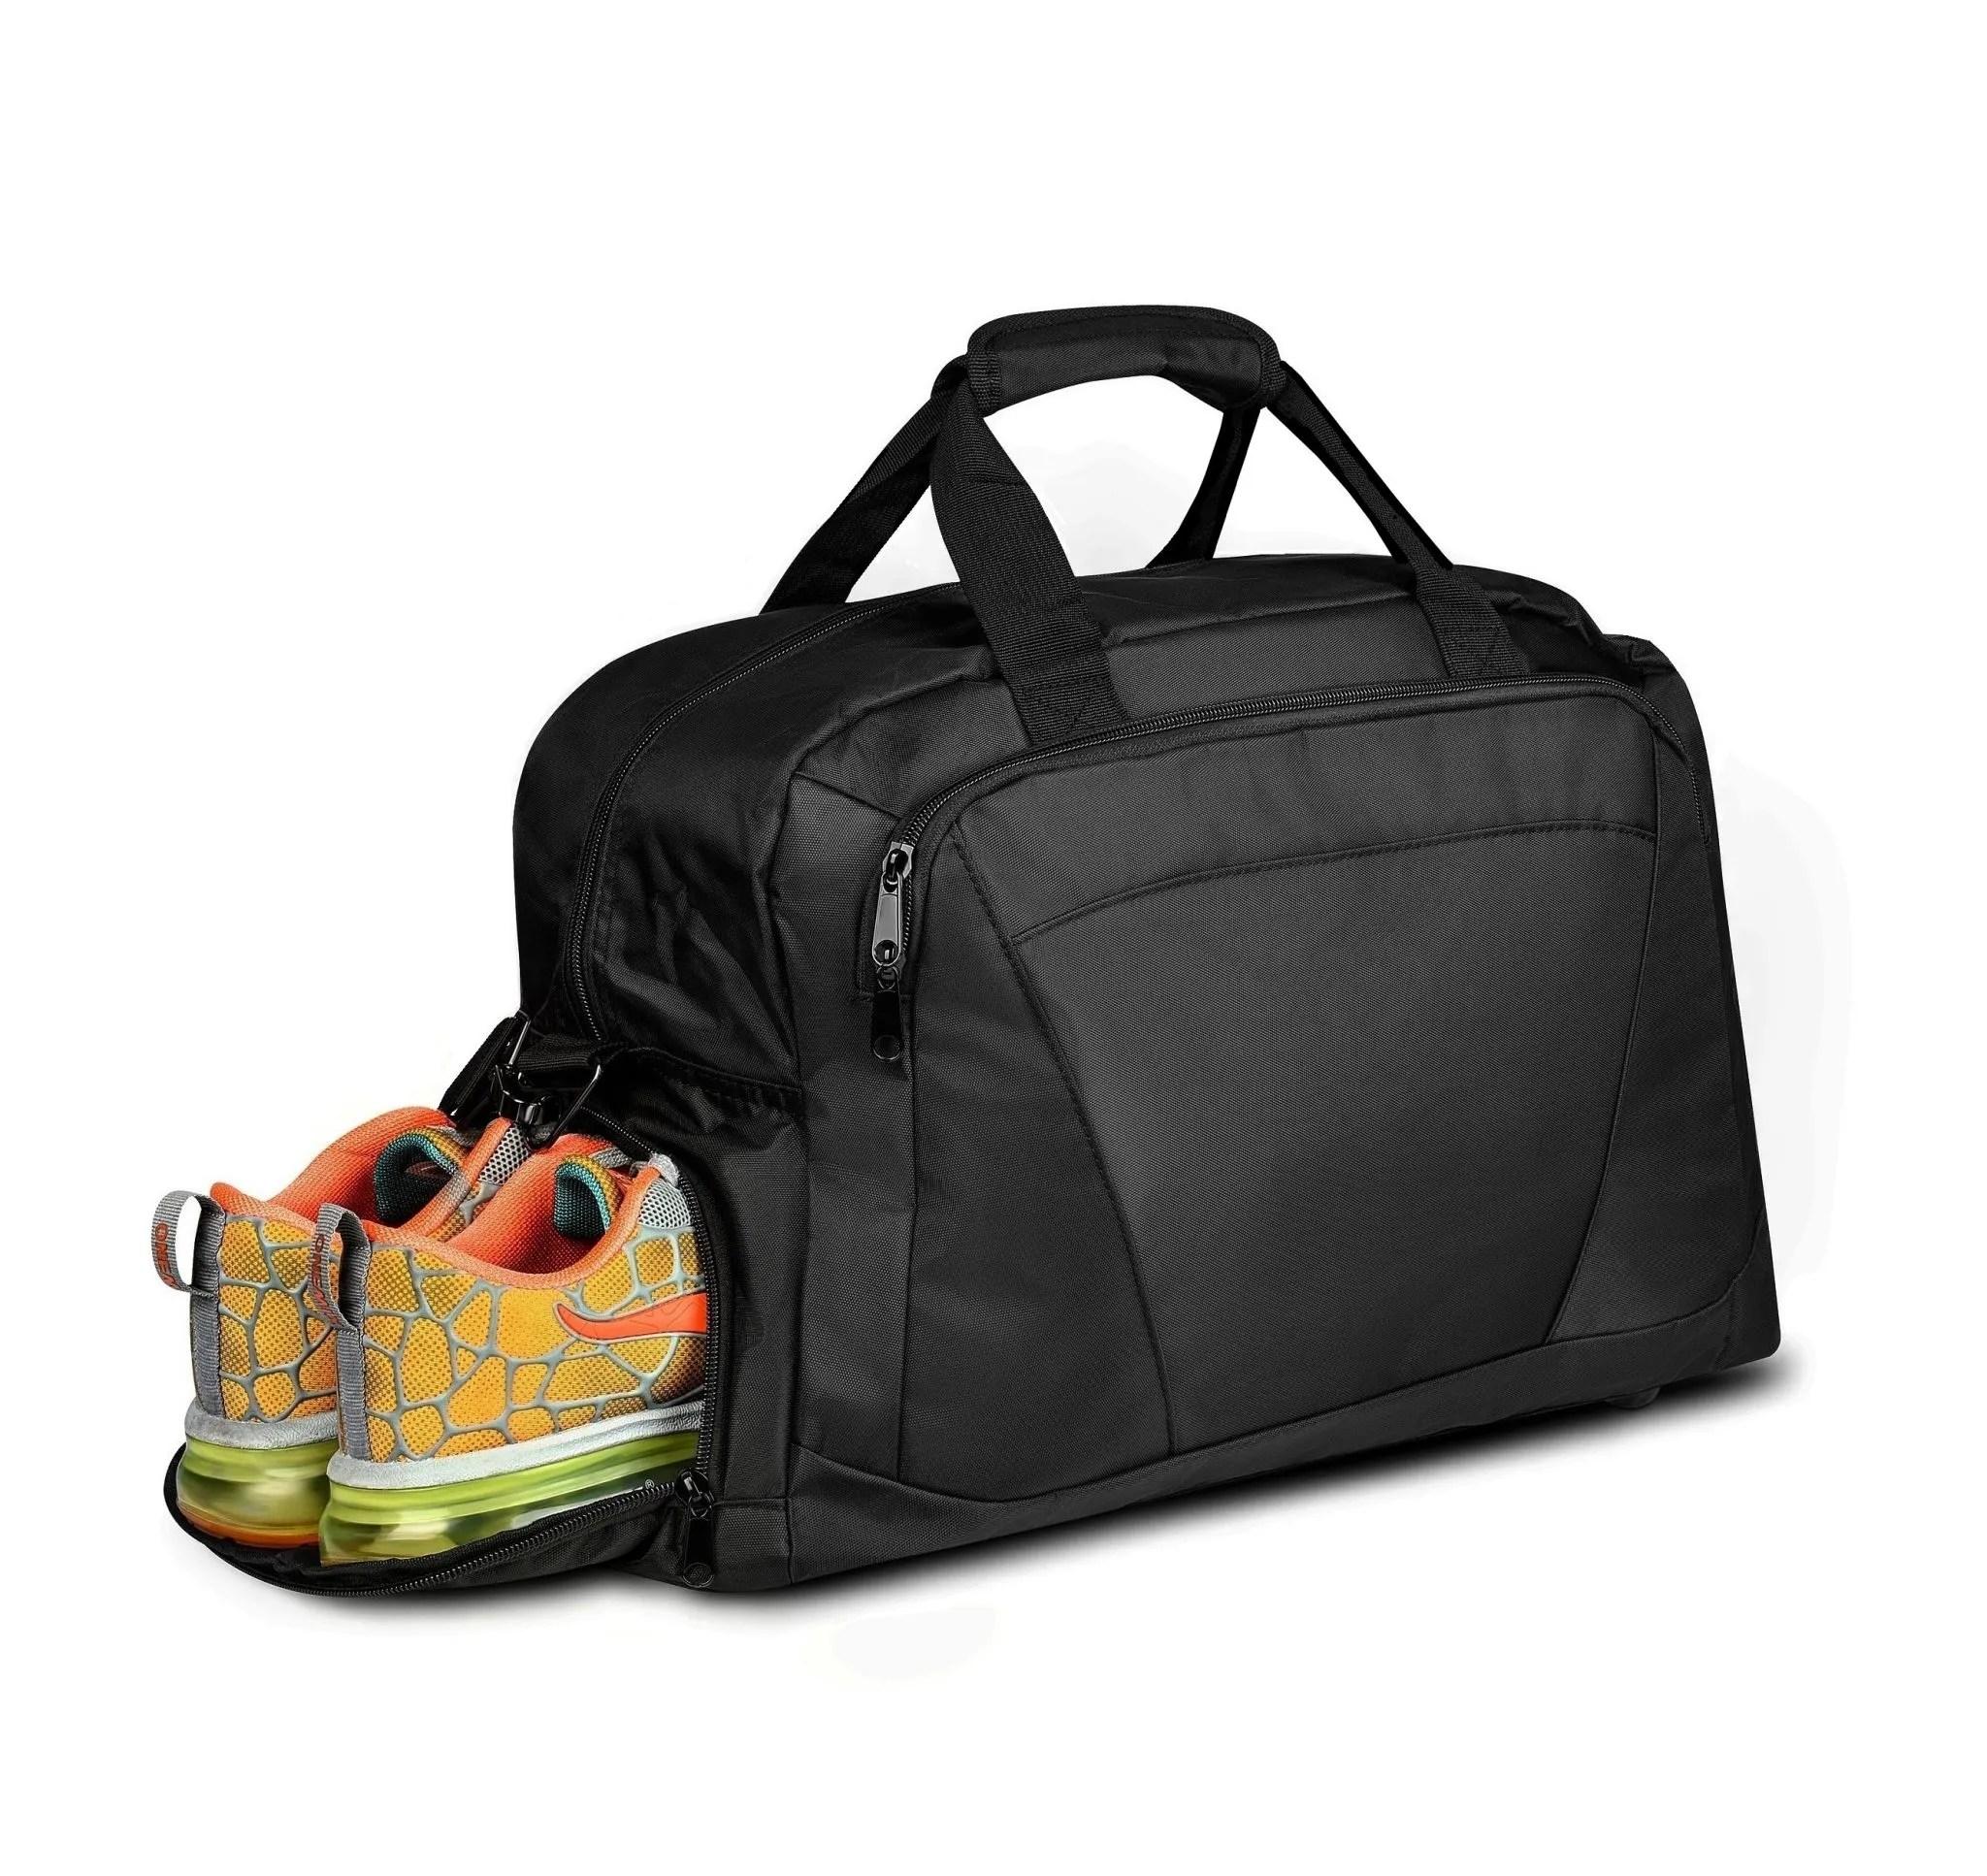 Hard Work Sports Gym Bag 2.0